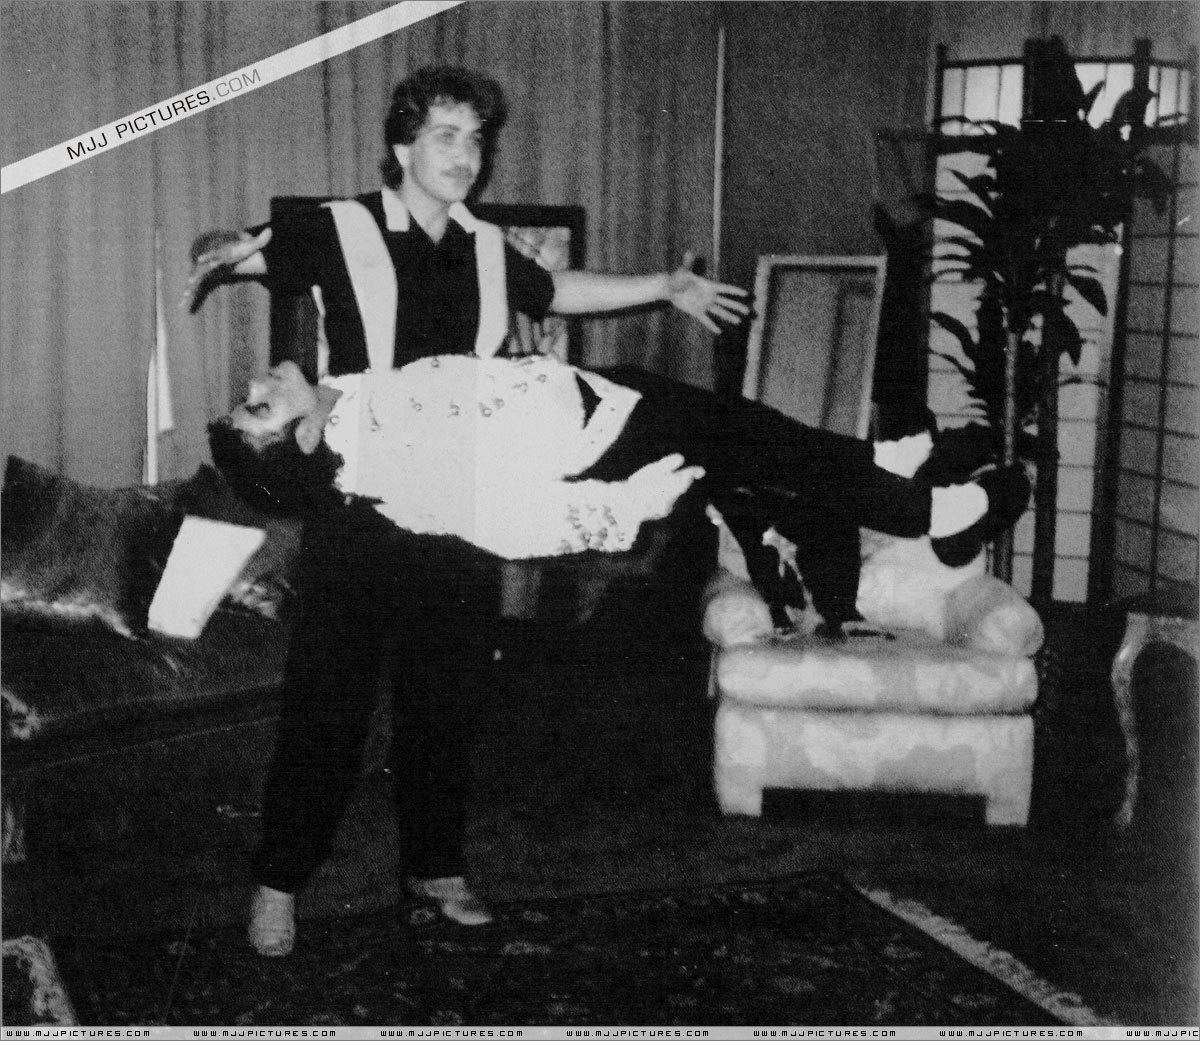 Michael Jackson Thriller Era The Thriller Era Photo